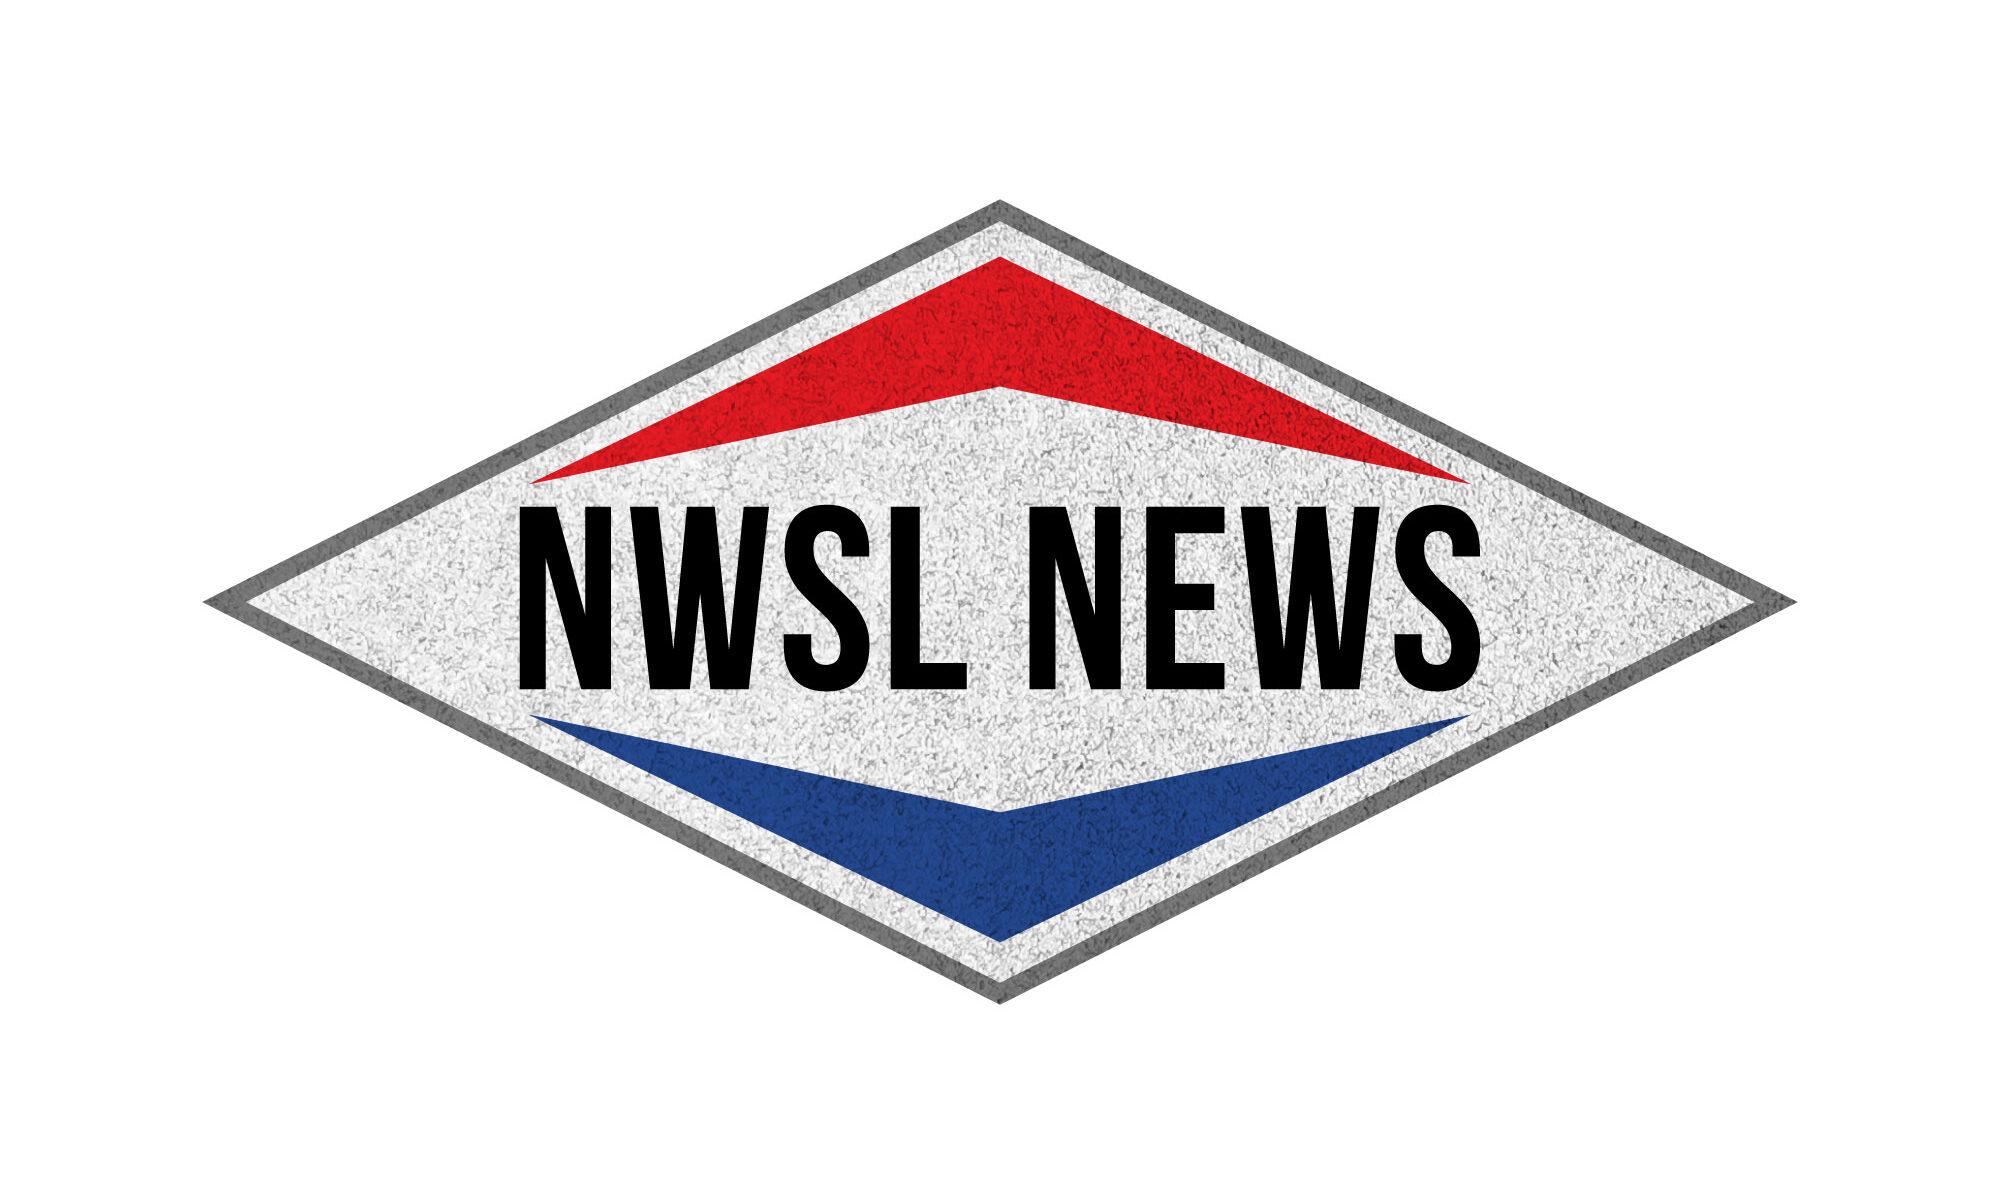 NWSL NEWS